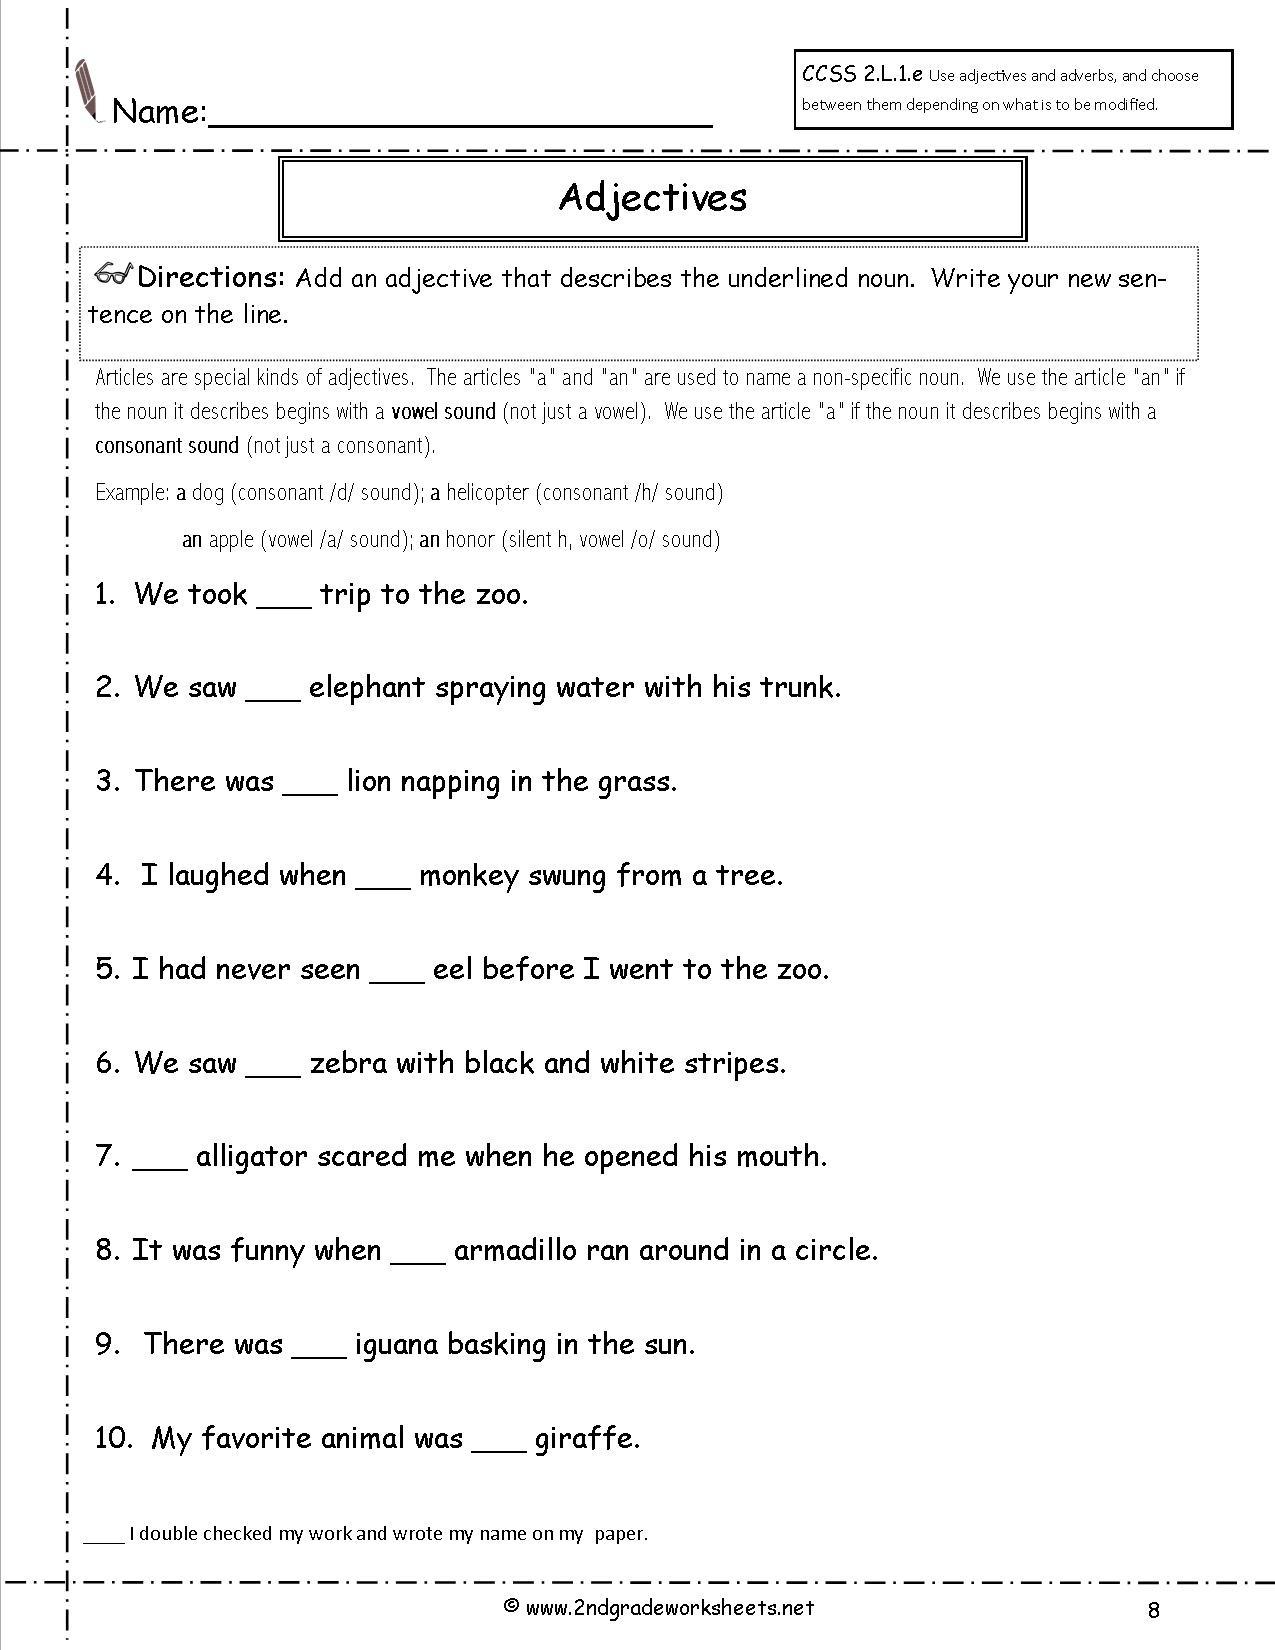 Free Language/grammar Worksheets And Printouts - Free Printable Ela Worksheets